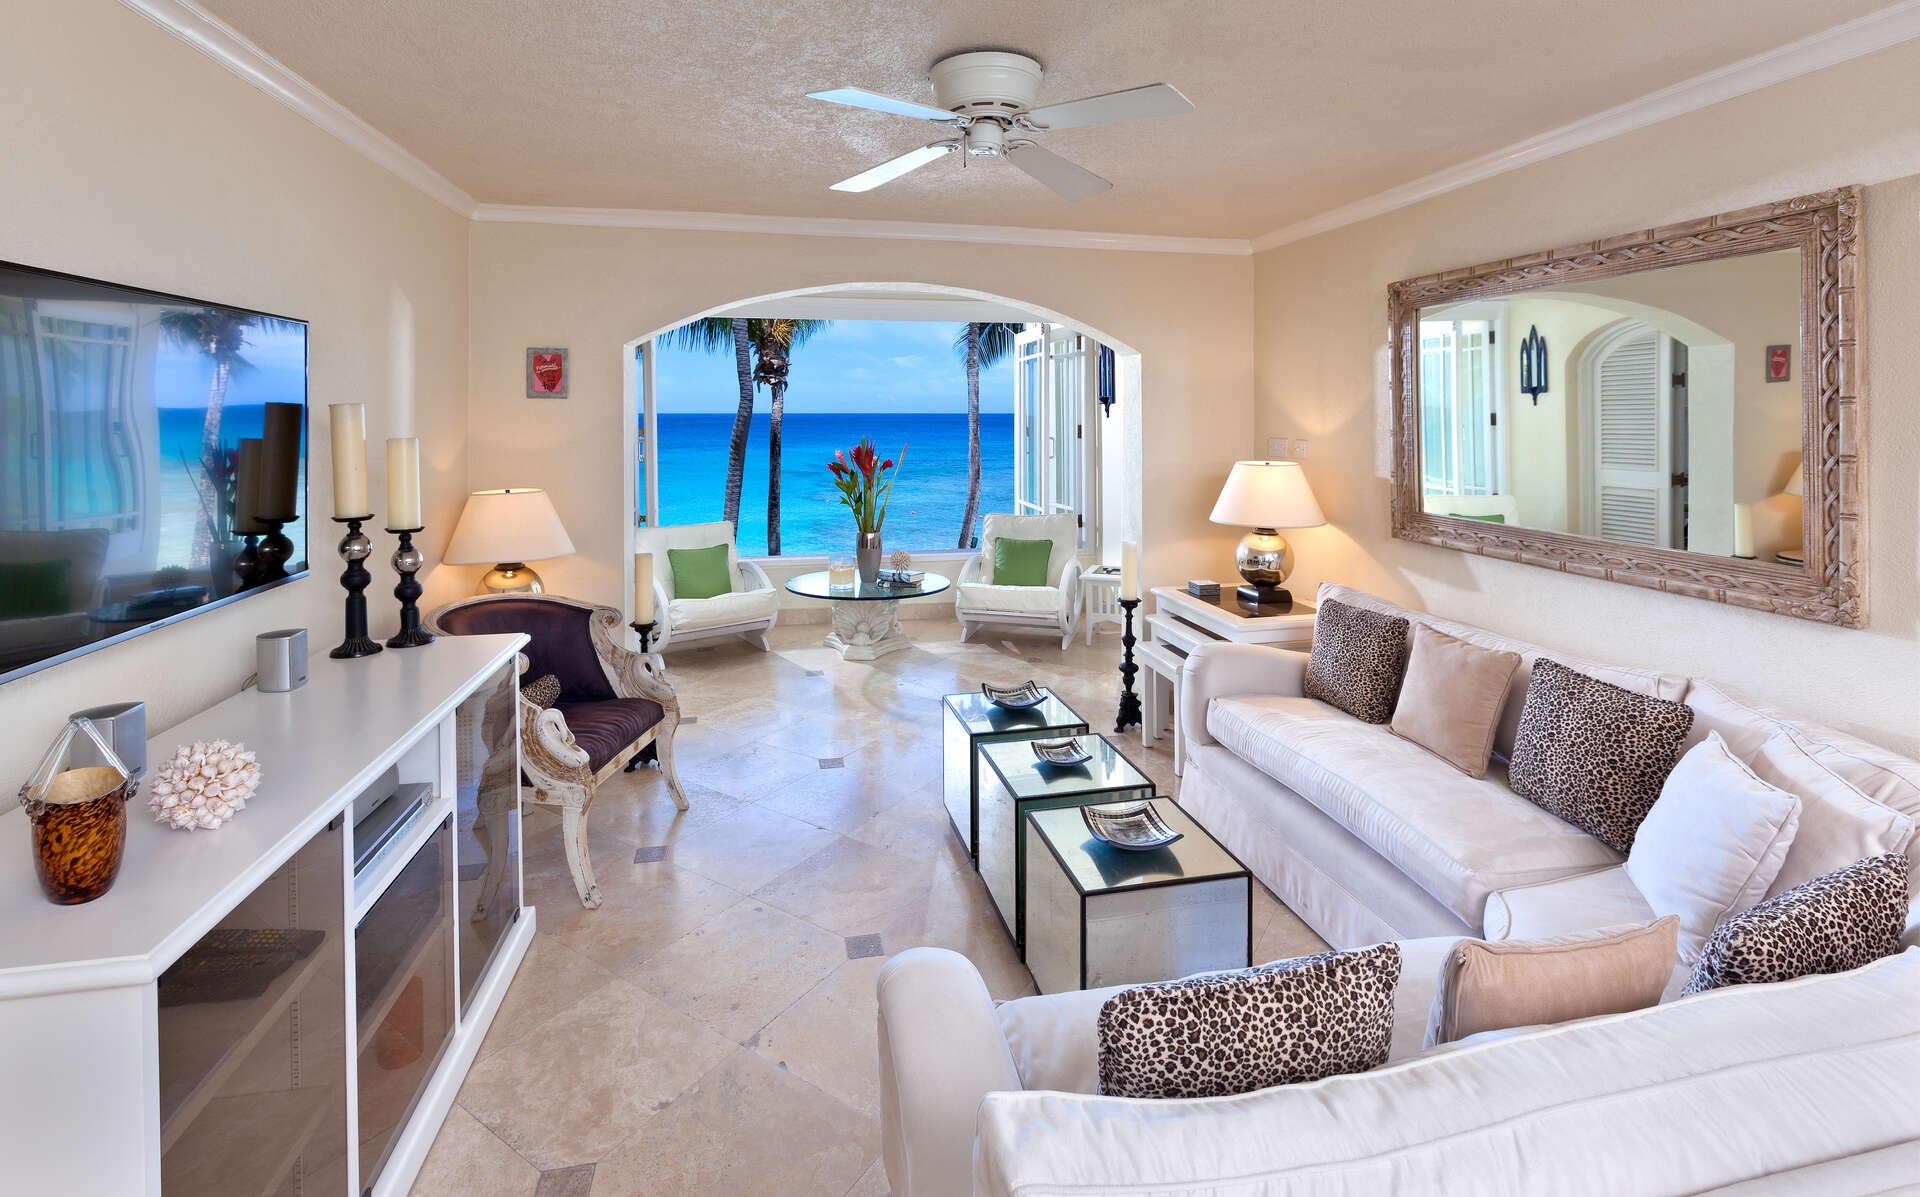 Luxury villa rentals caribbean - Barbados - St james - Reeds bay - Reeds House  12 - Image 1/11